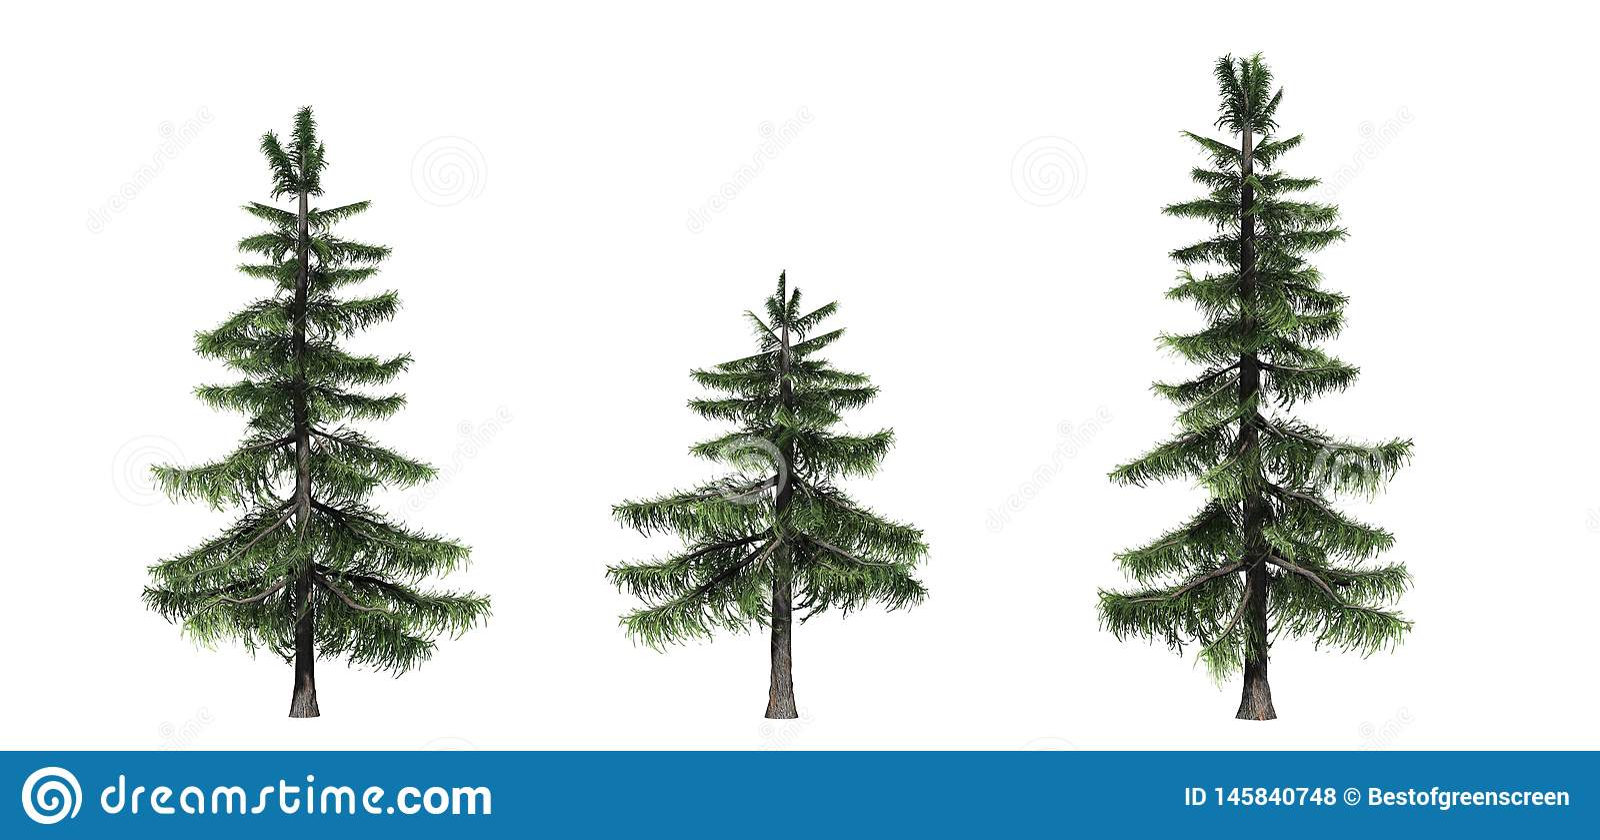 Fije de árboles de cedro de Alaska